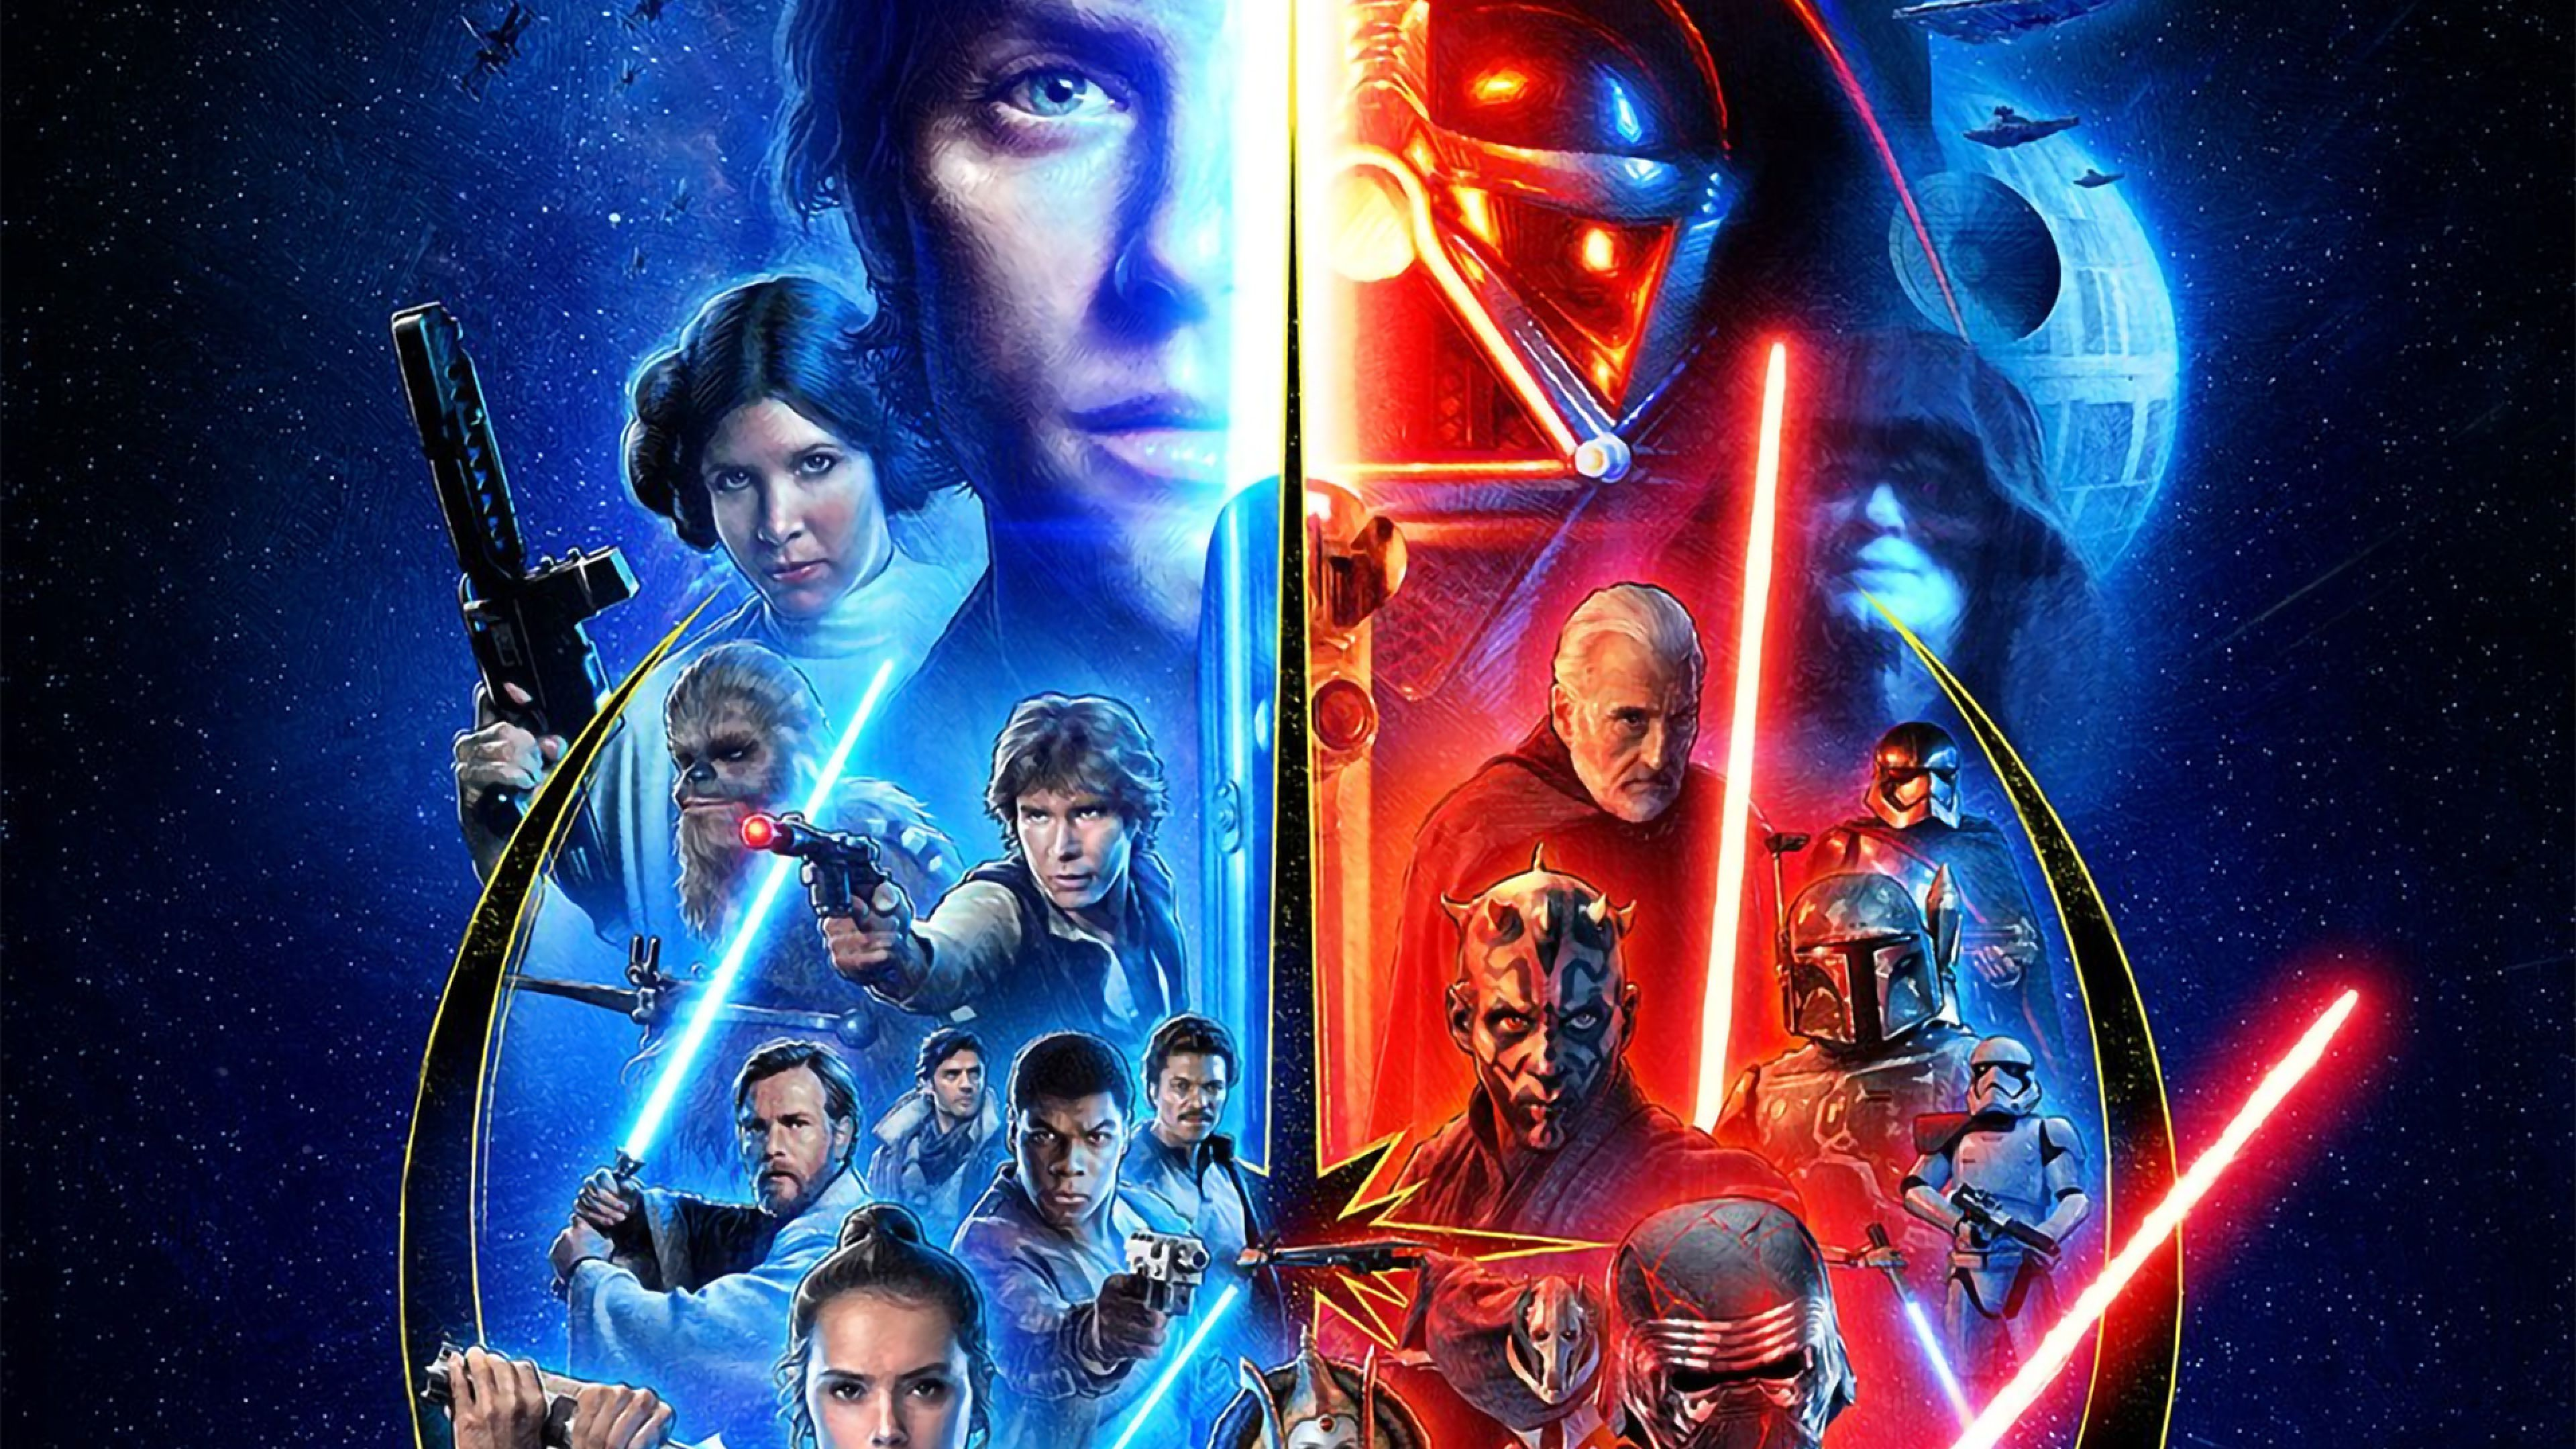 Star Wars Saga Wallpapers Wallpaper Cave